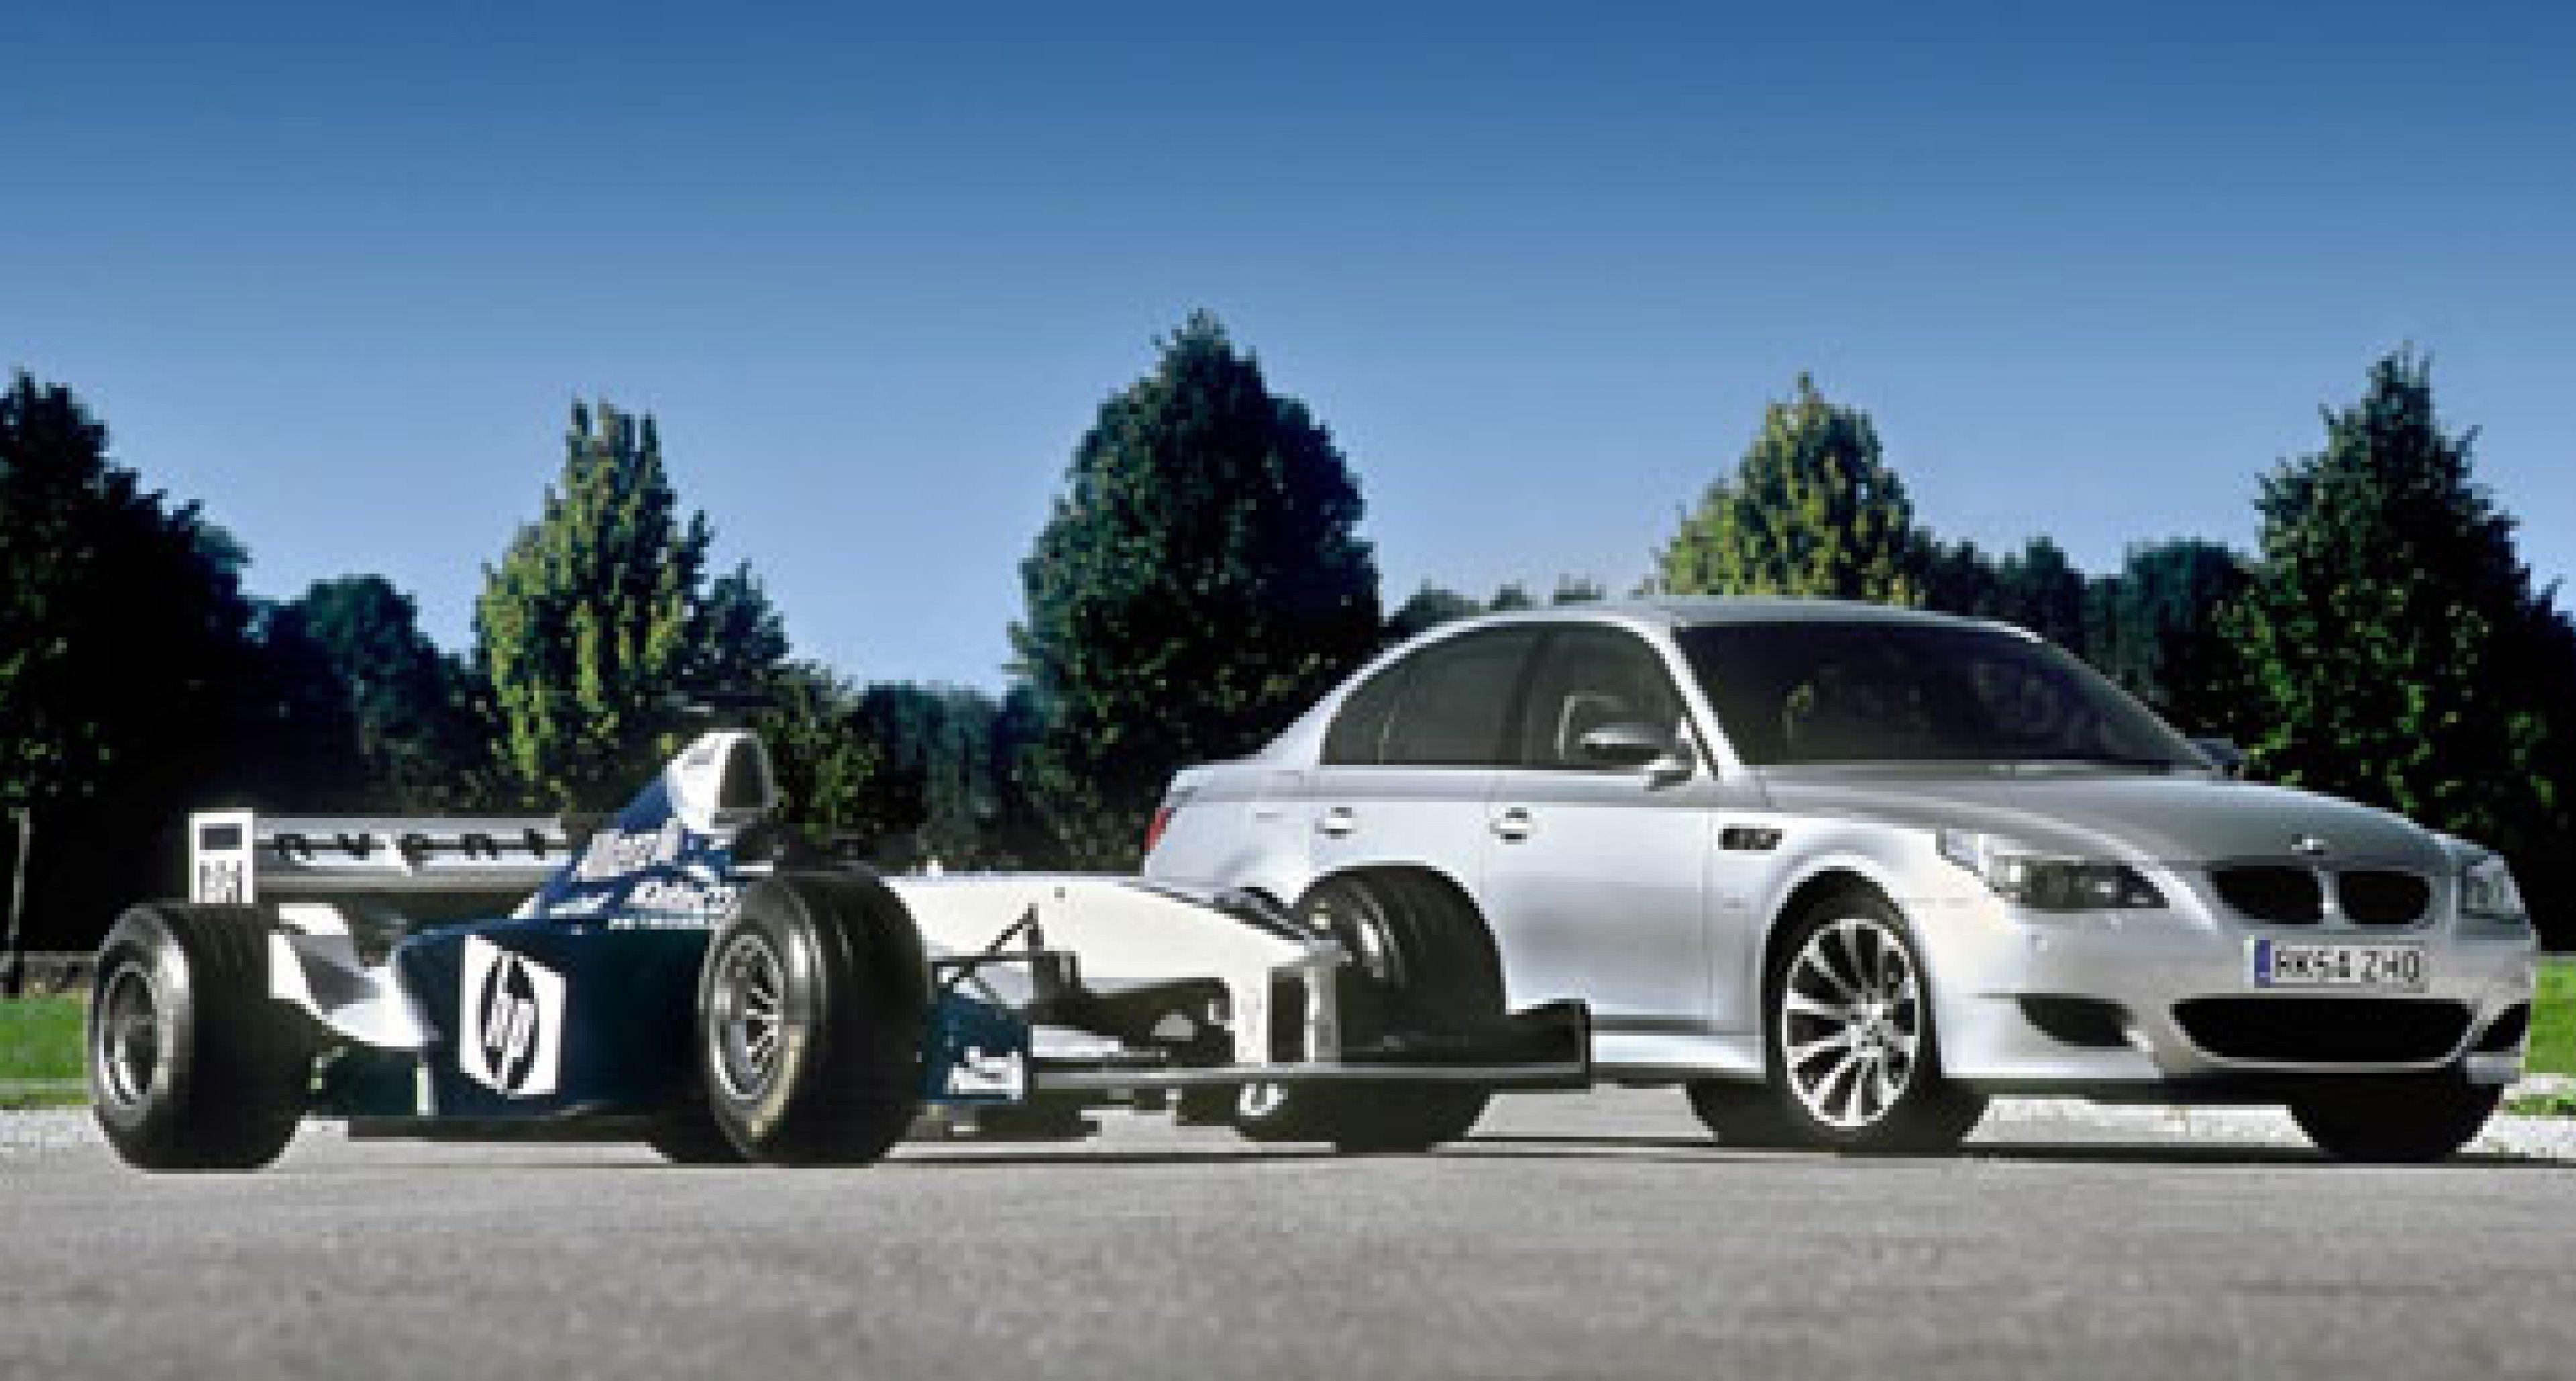 The new BMW M3 CS Coupé